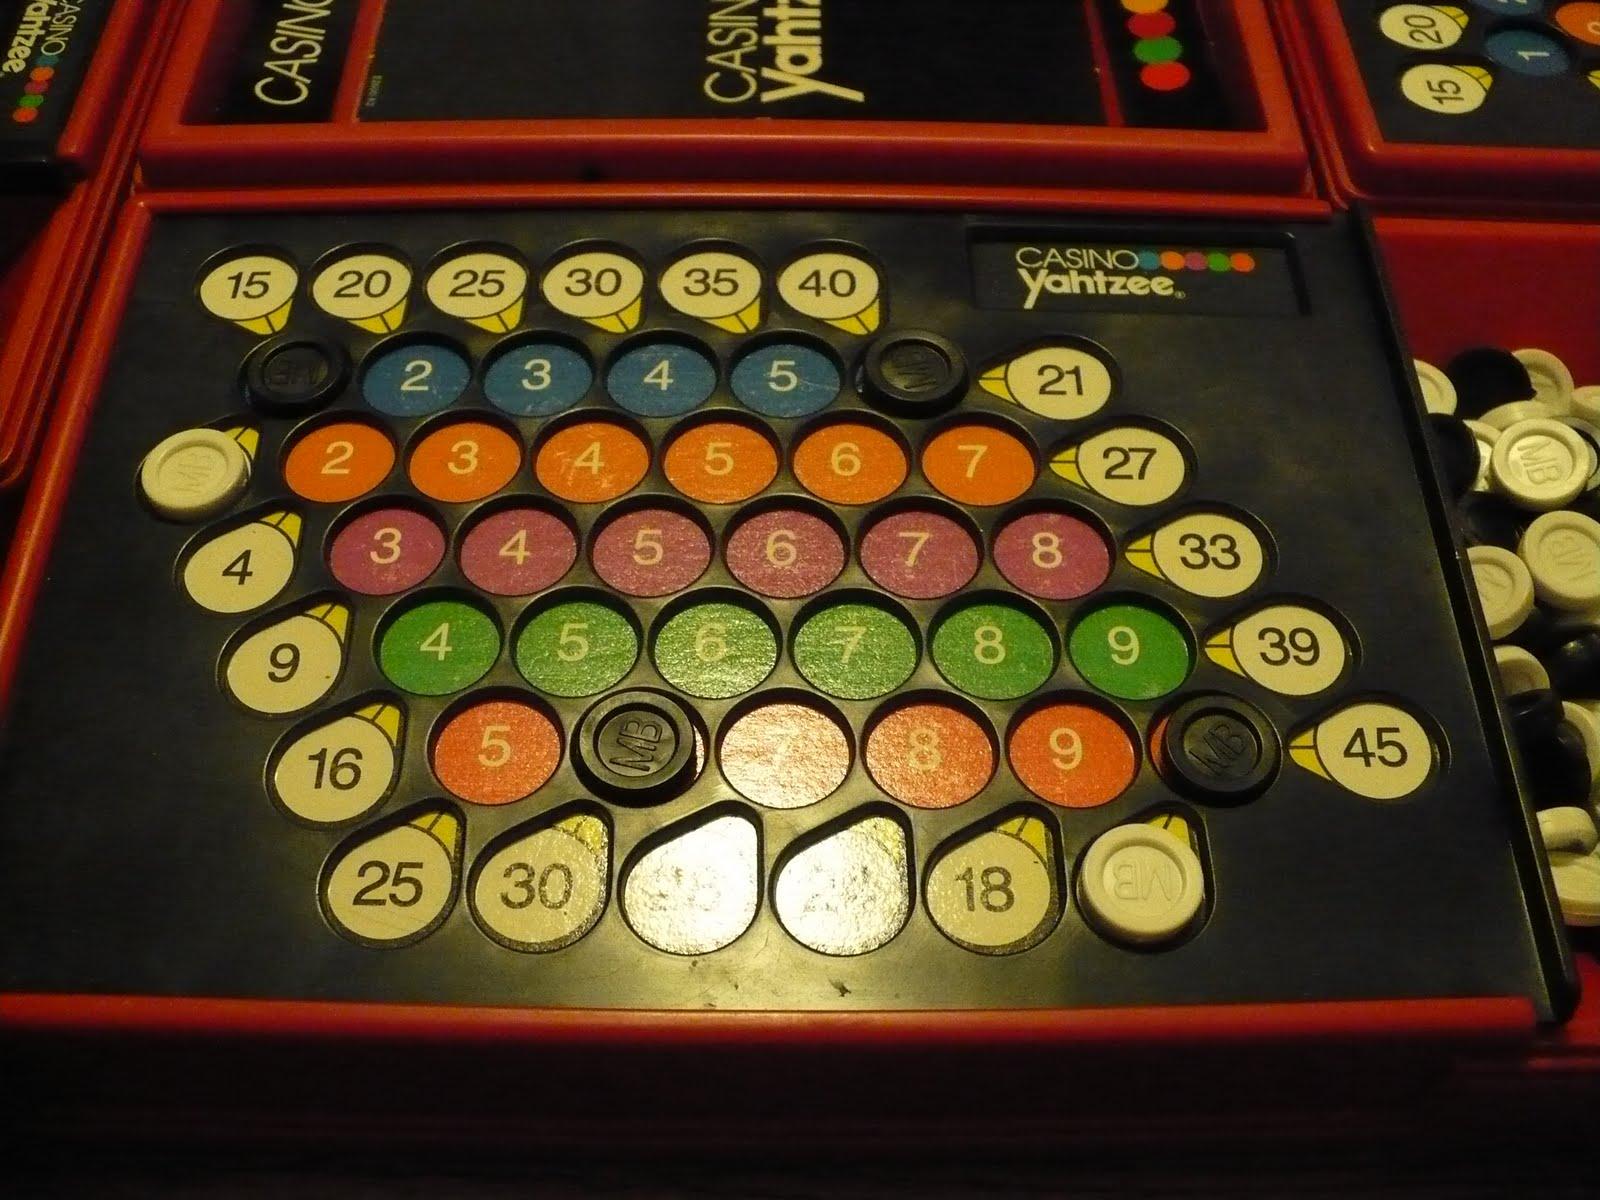 Casino Yahtzee Board Game